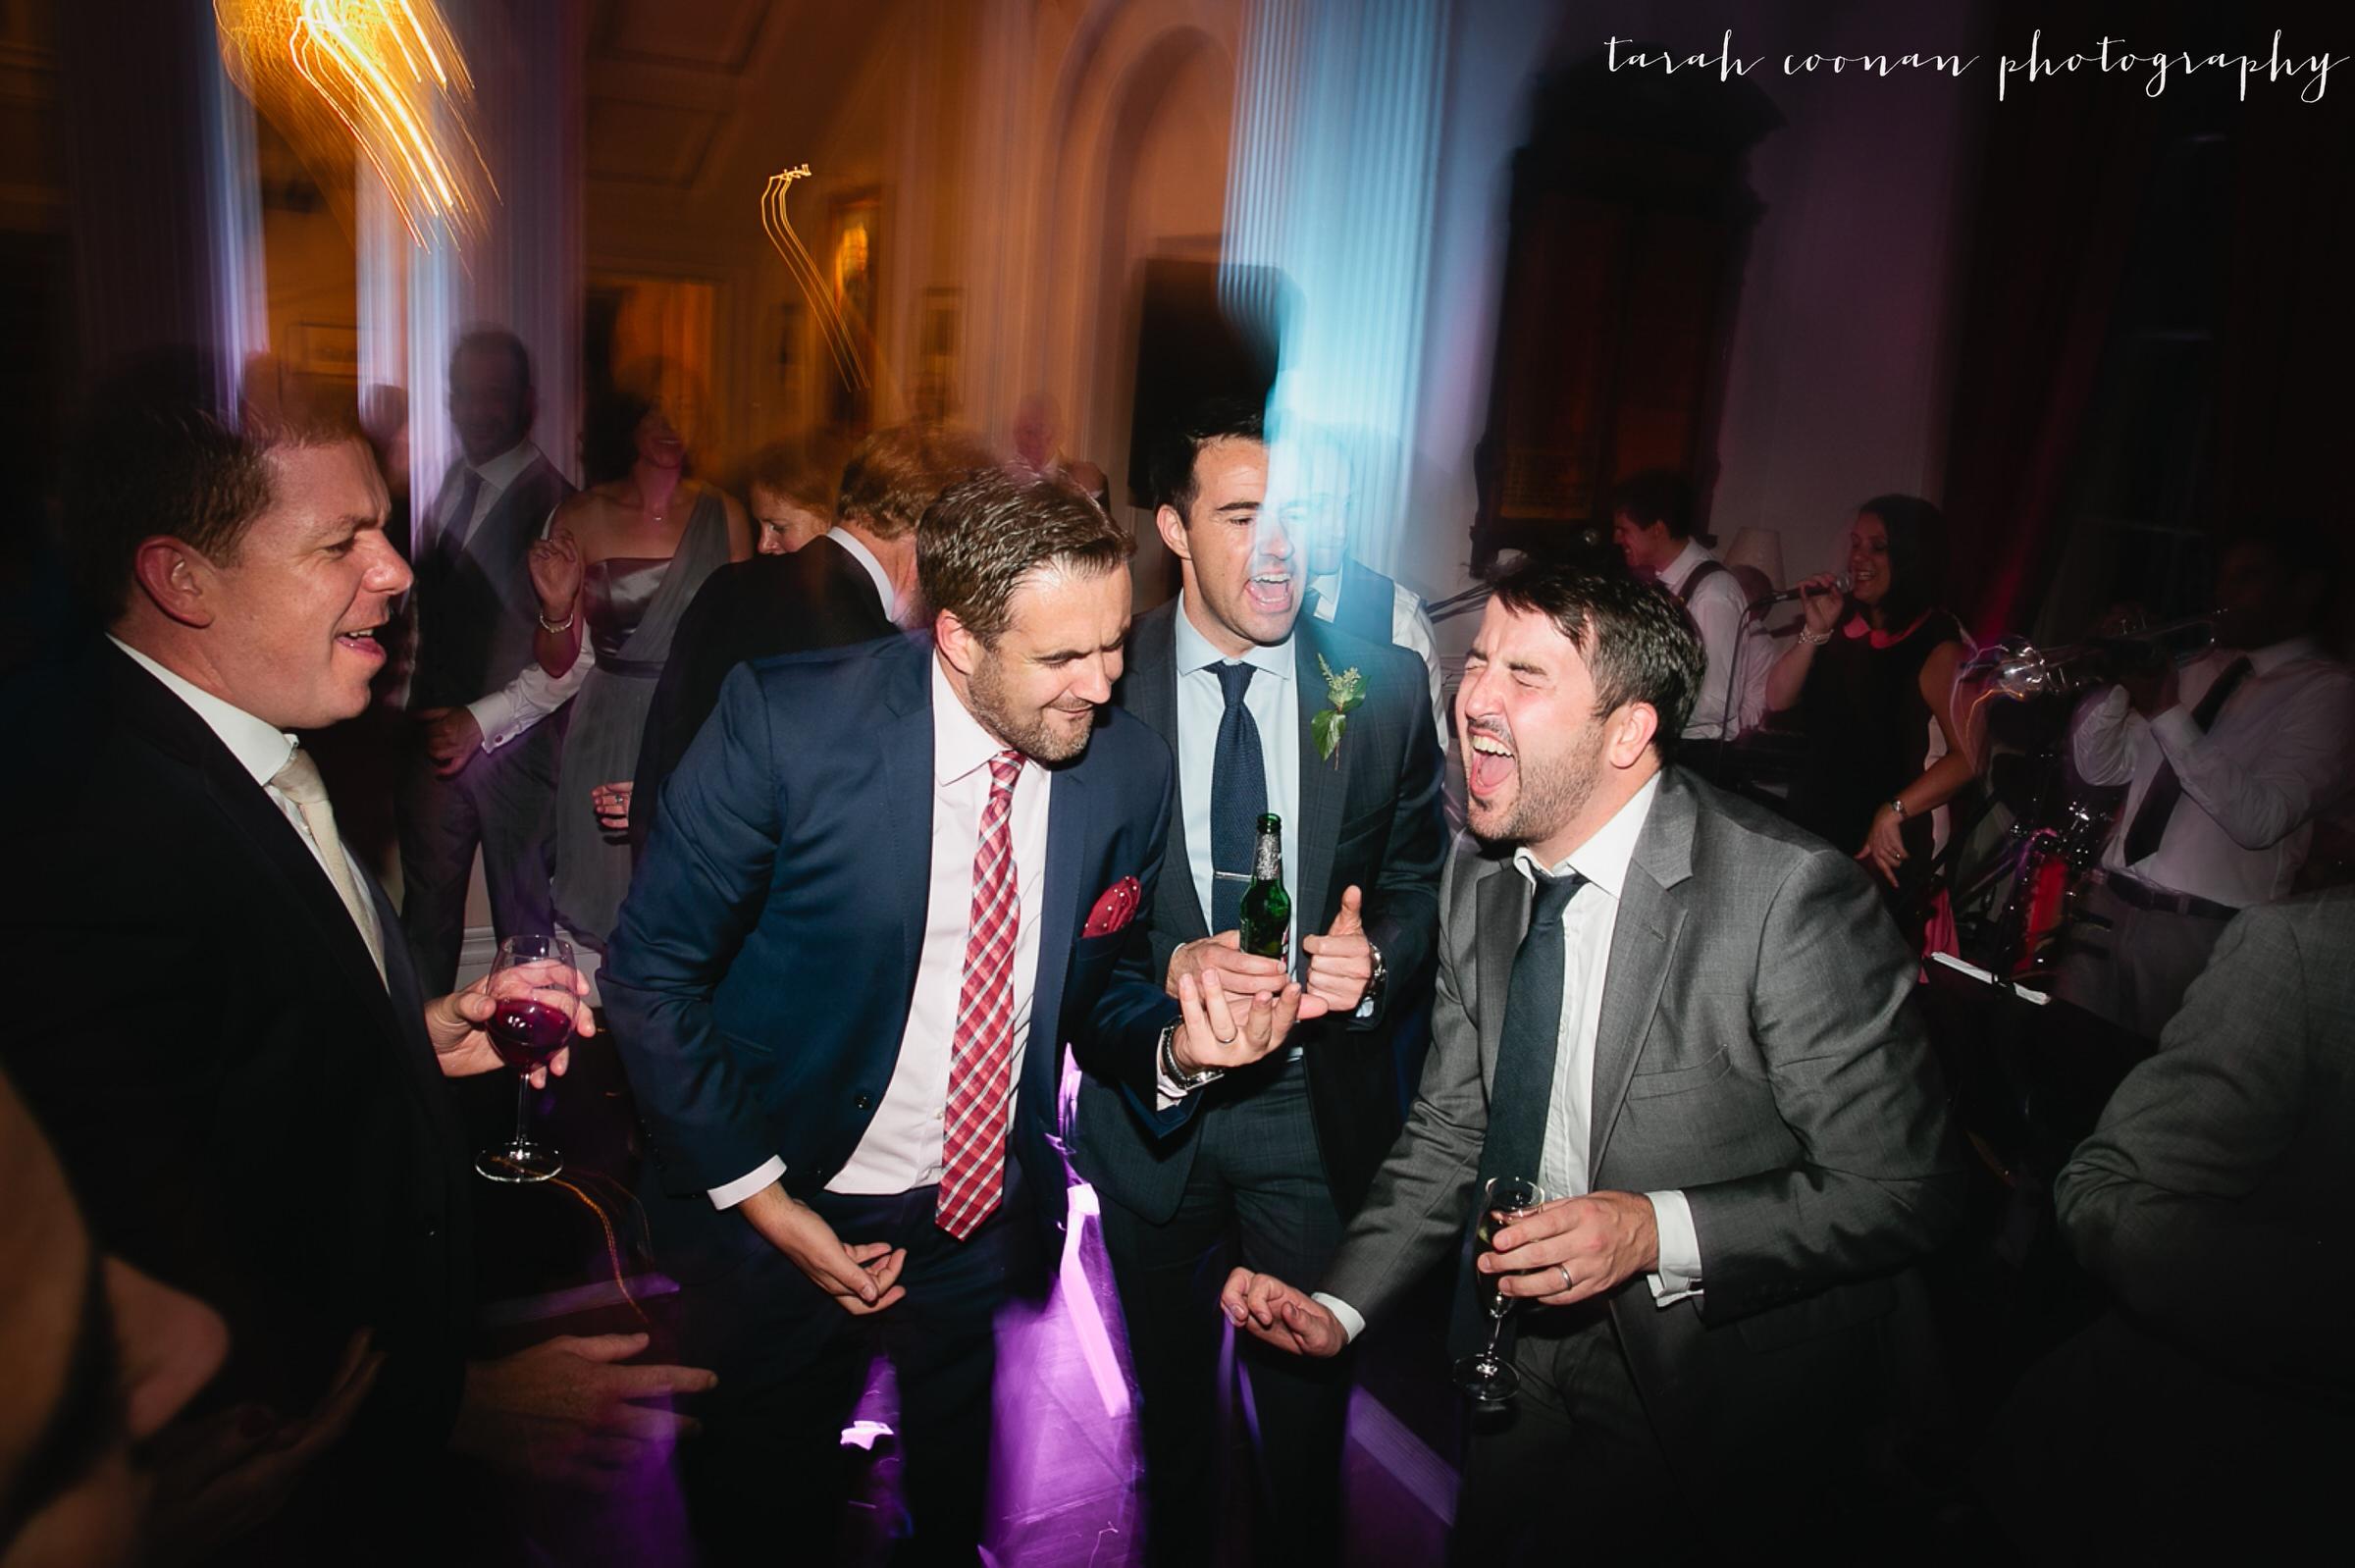 brighton-wedding-photographer120